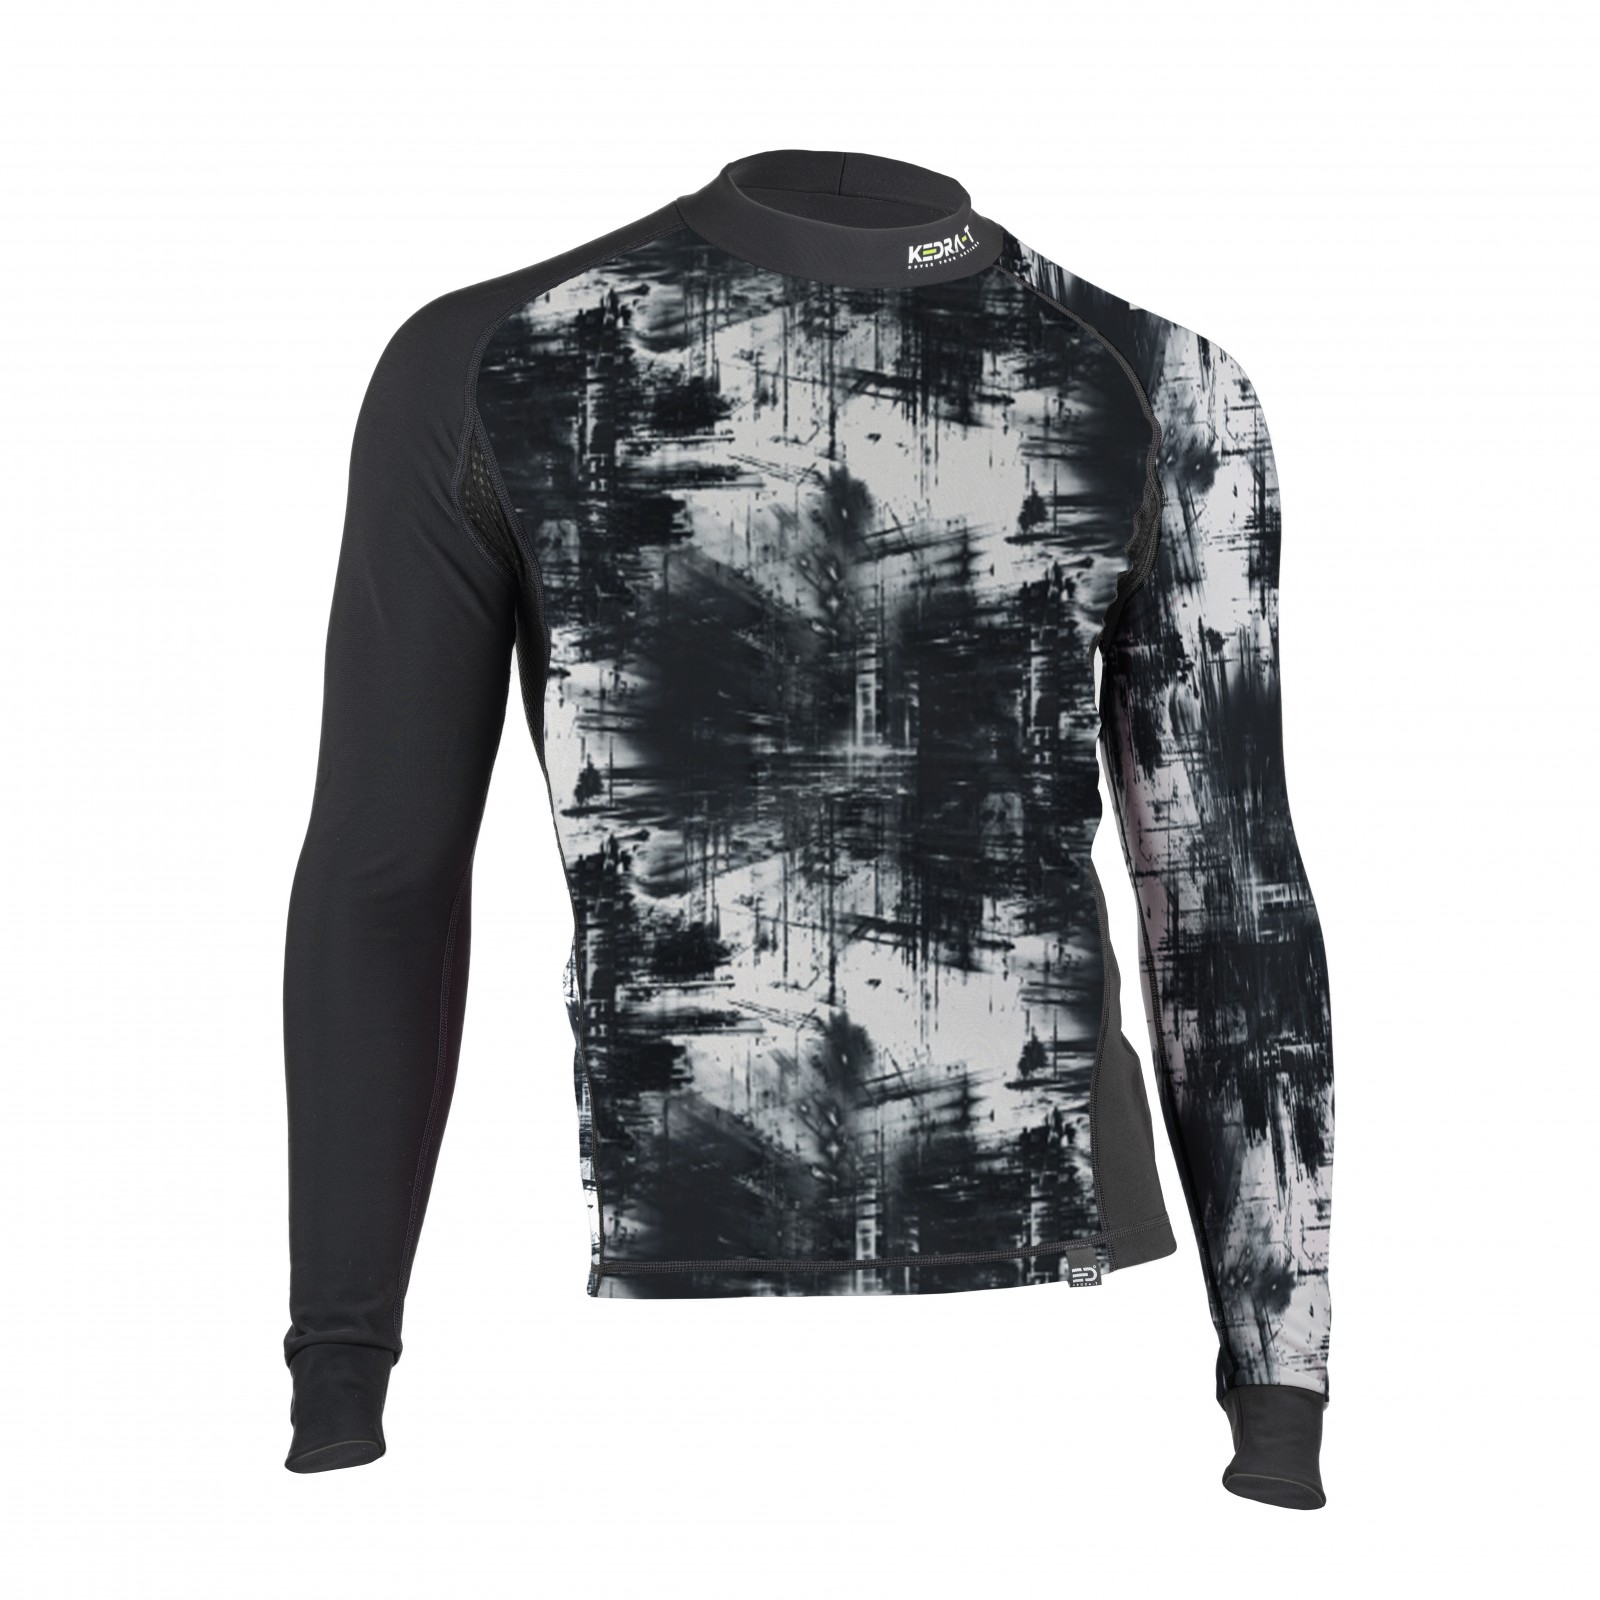 Shirt in Technical Fleece and Polypropilene - Comics MEN SIZE